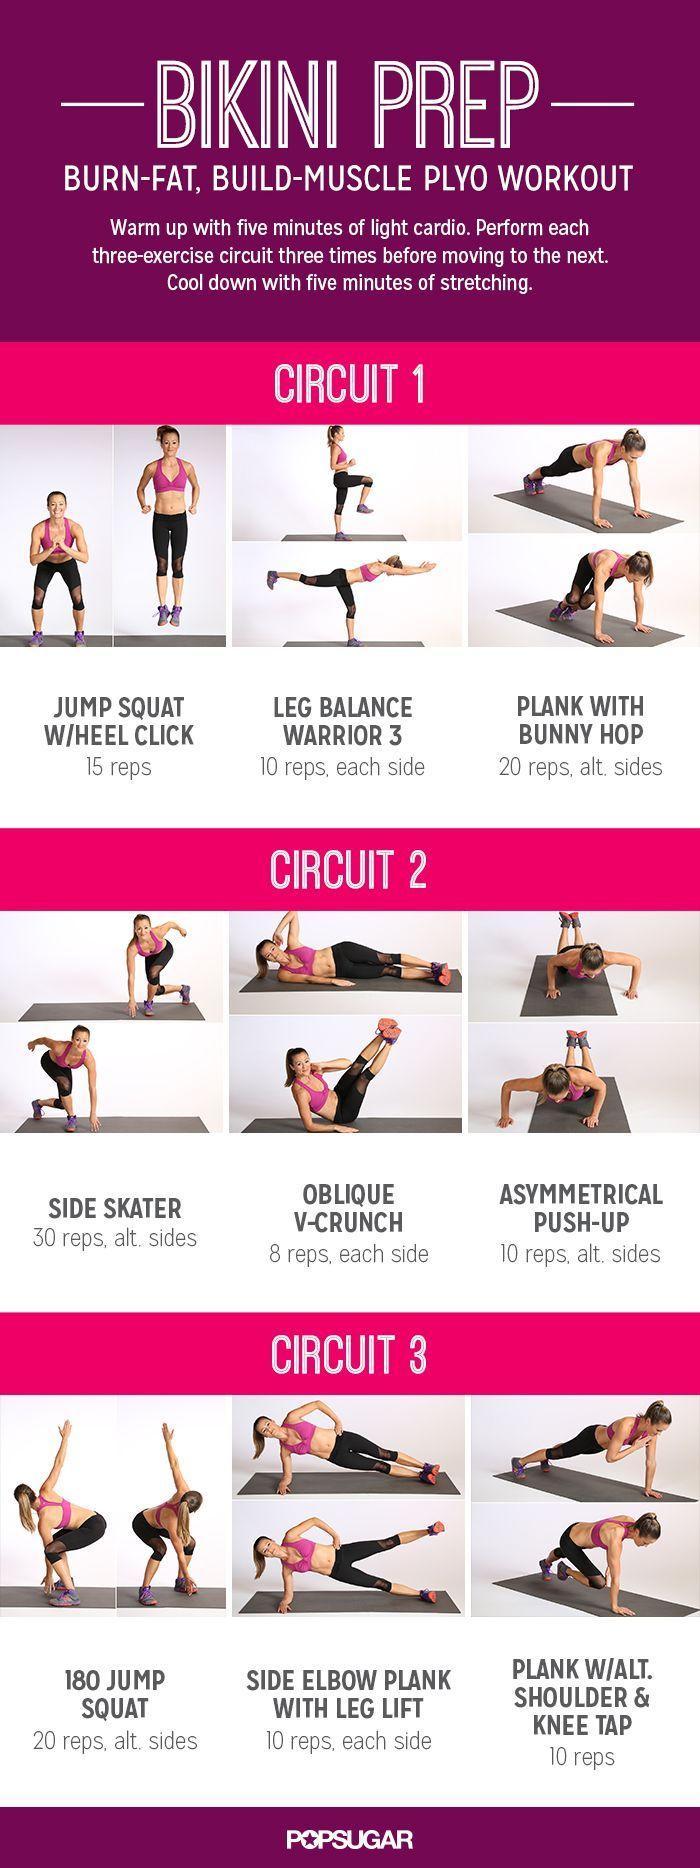 Bikini Prep: Burn fat, build muscle - Plyo workout